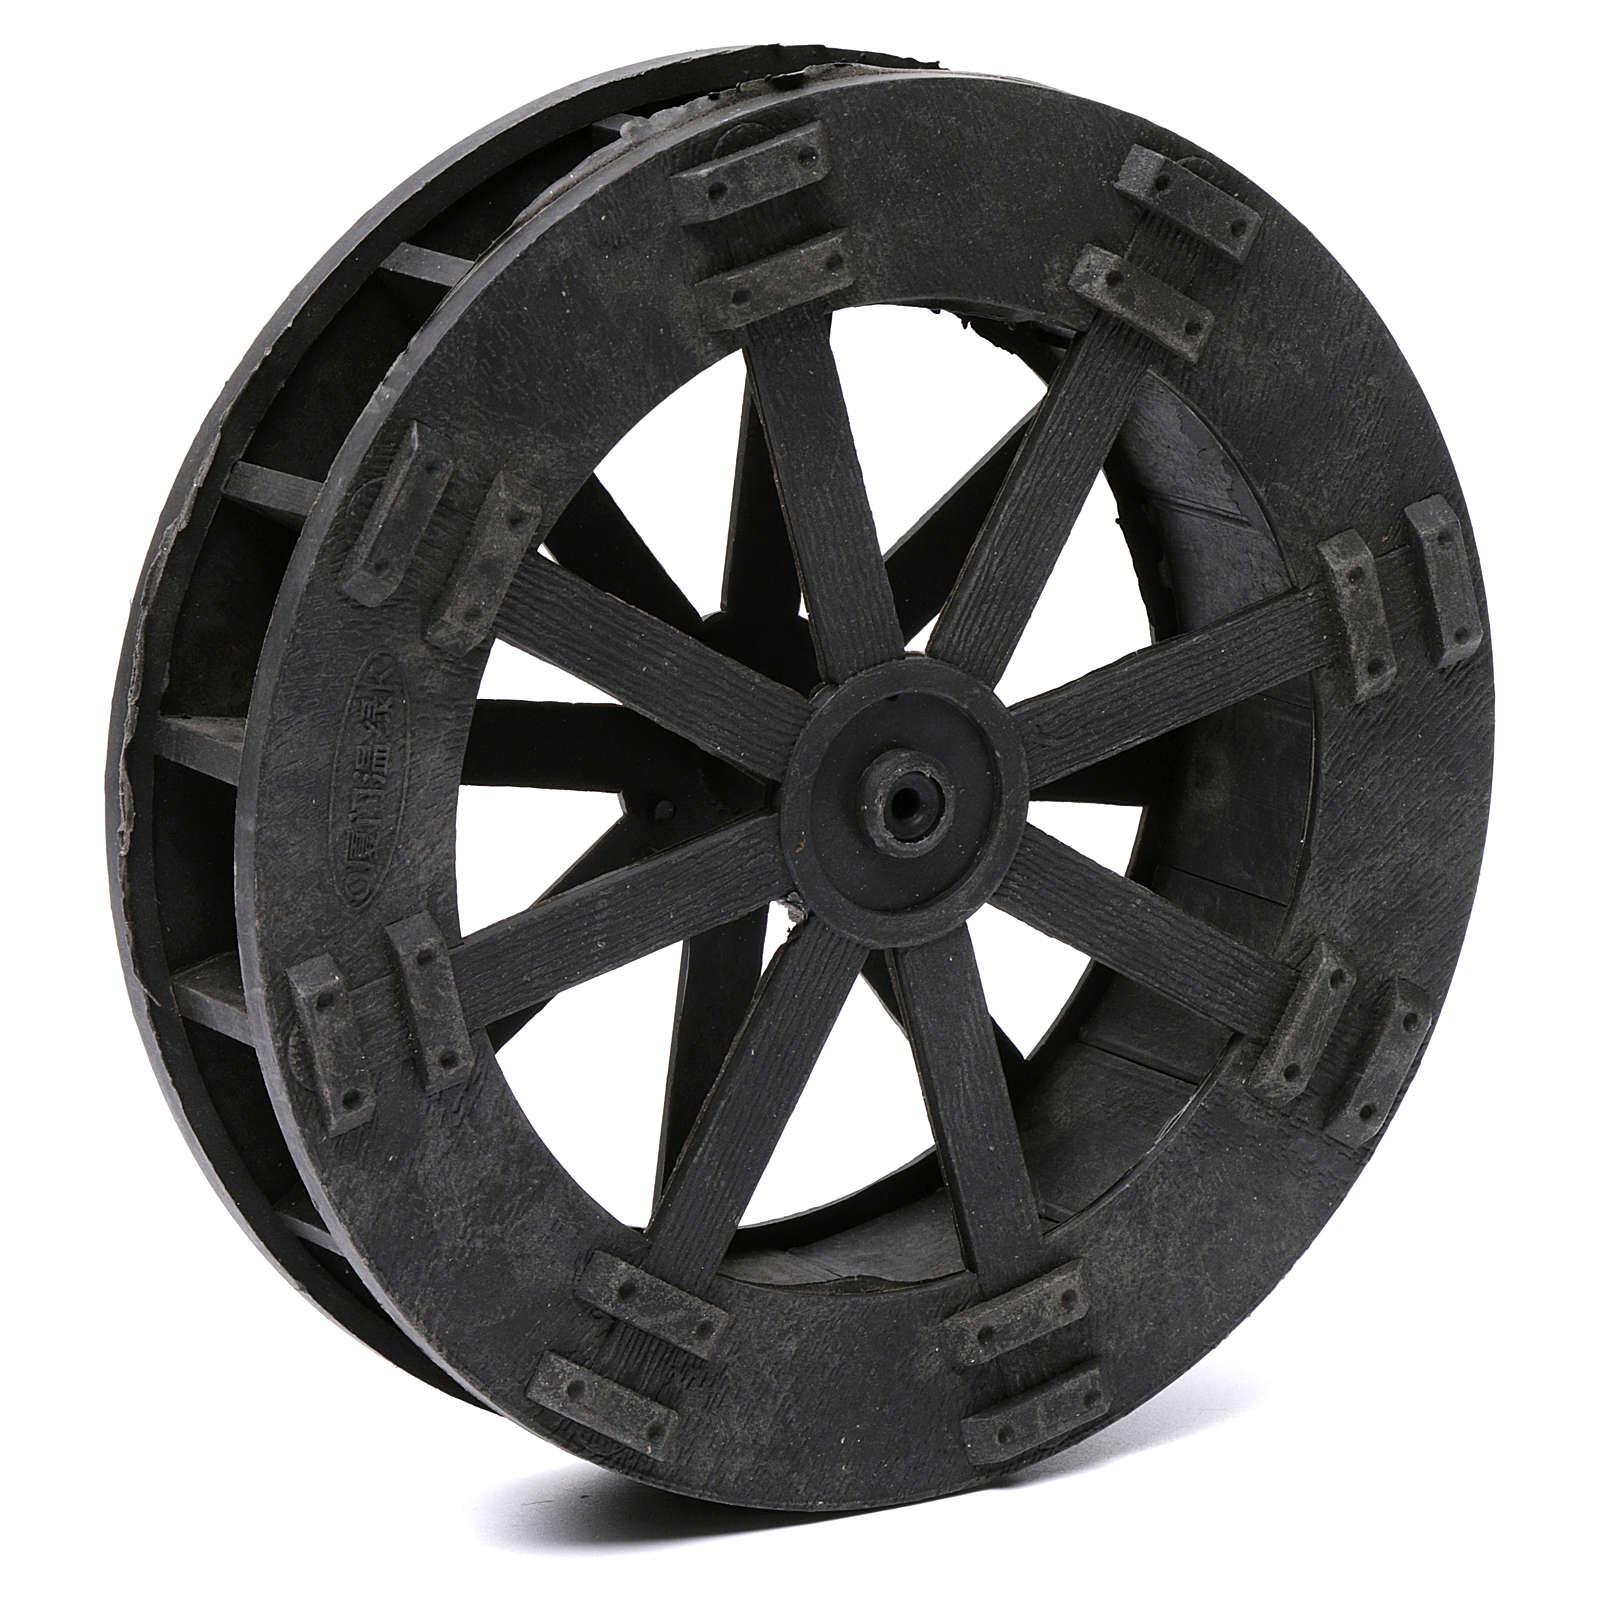 Watermill wheel in plastic diameter 20 cm 4